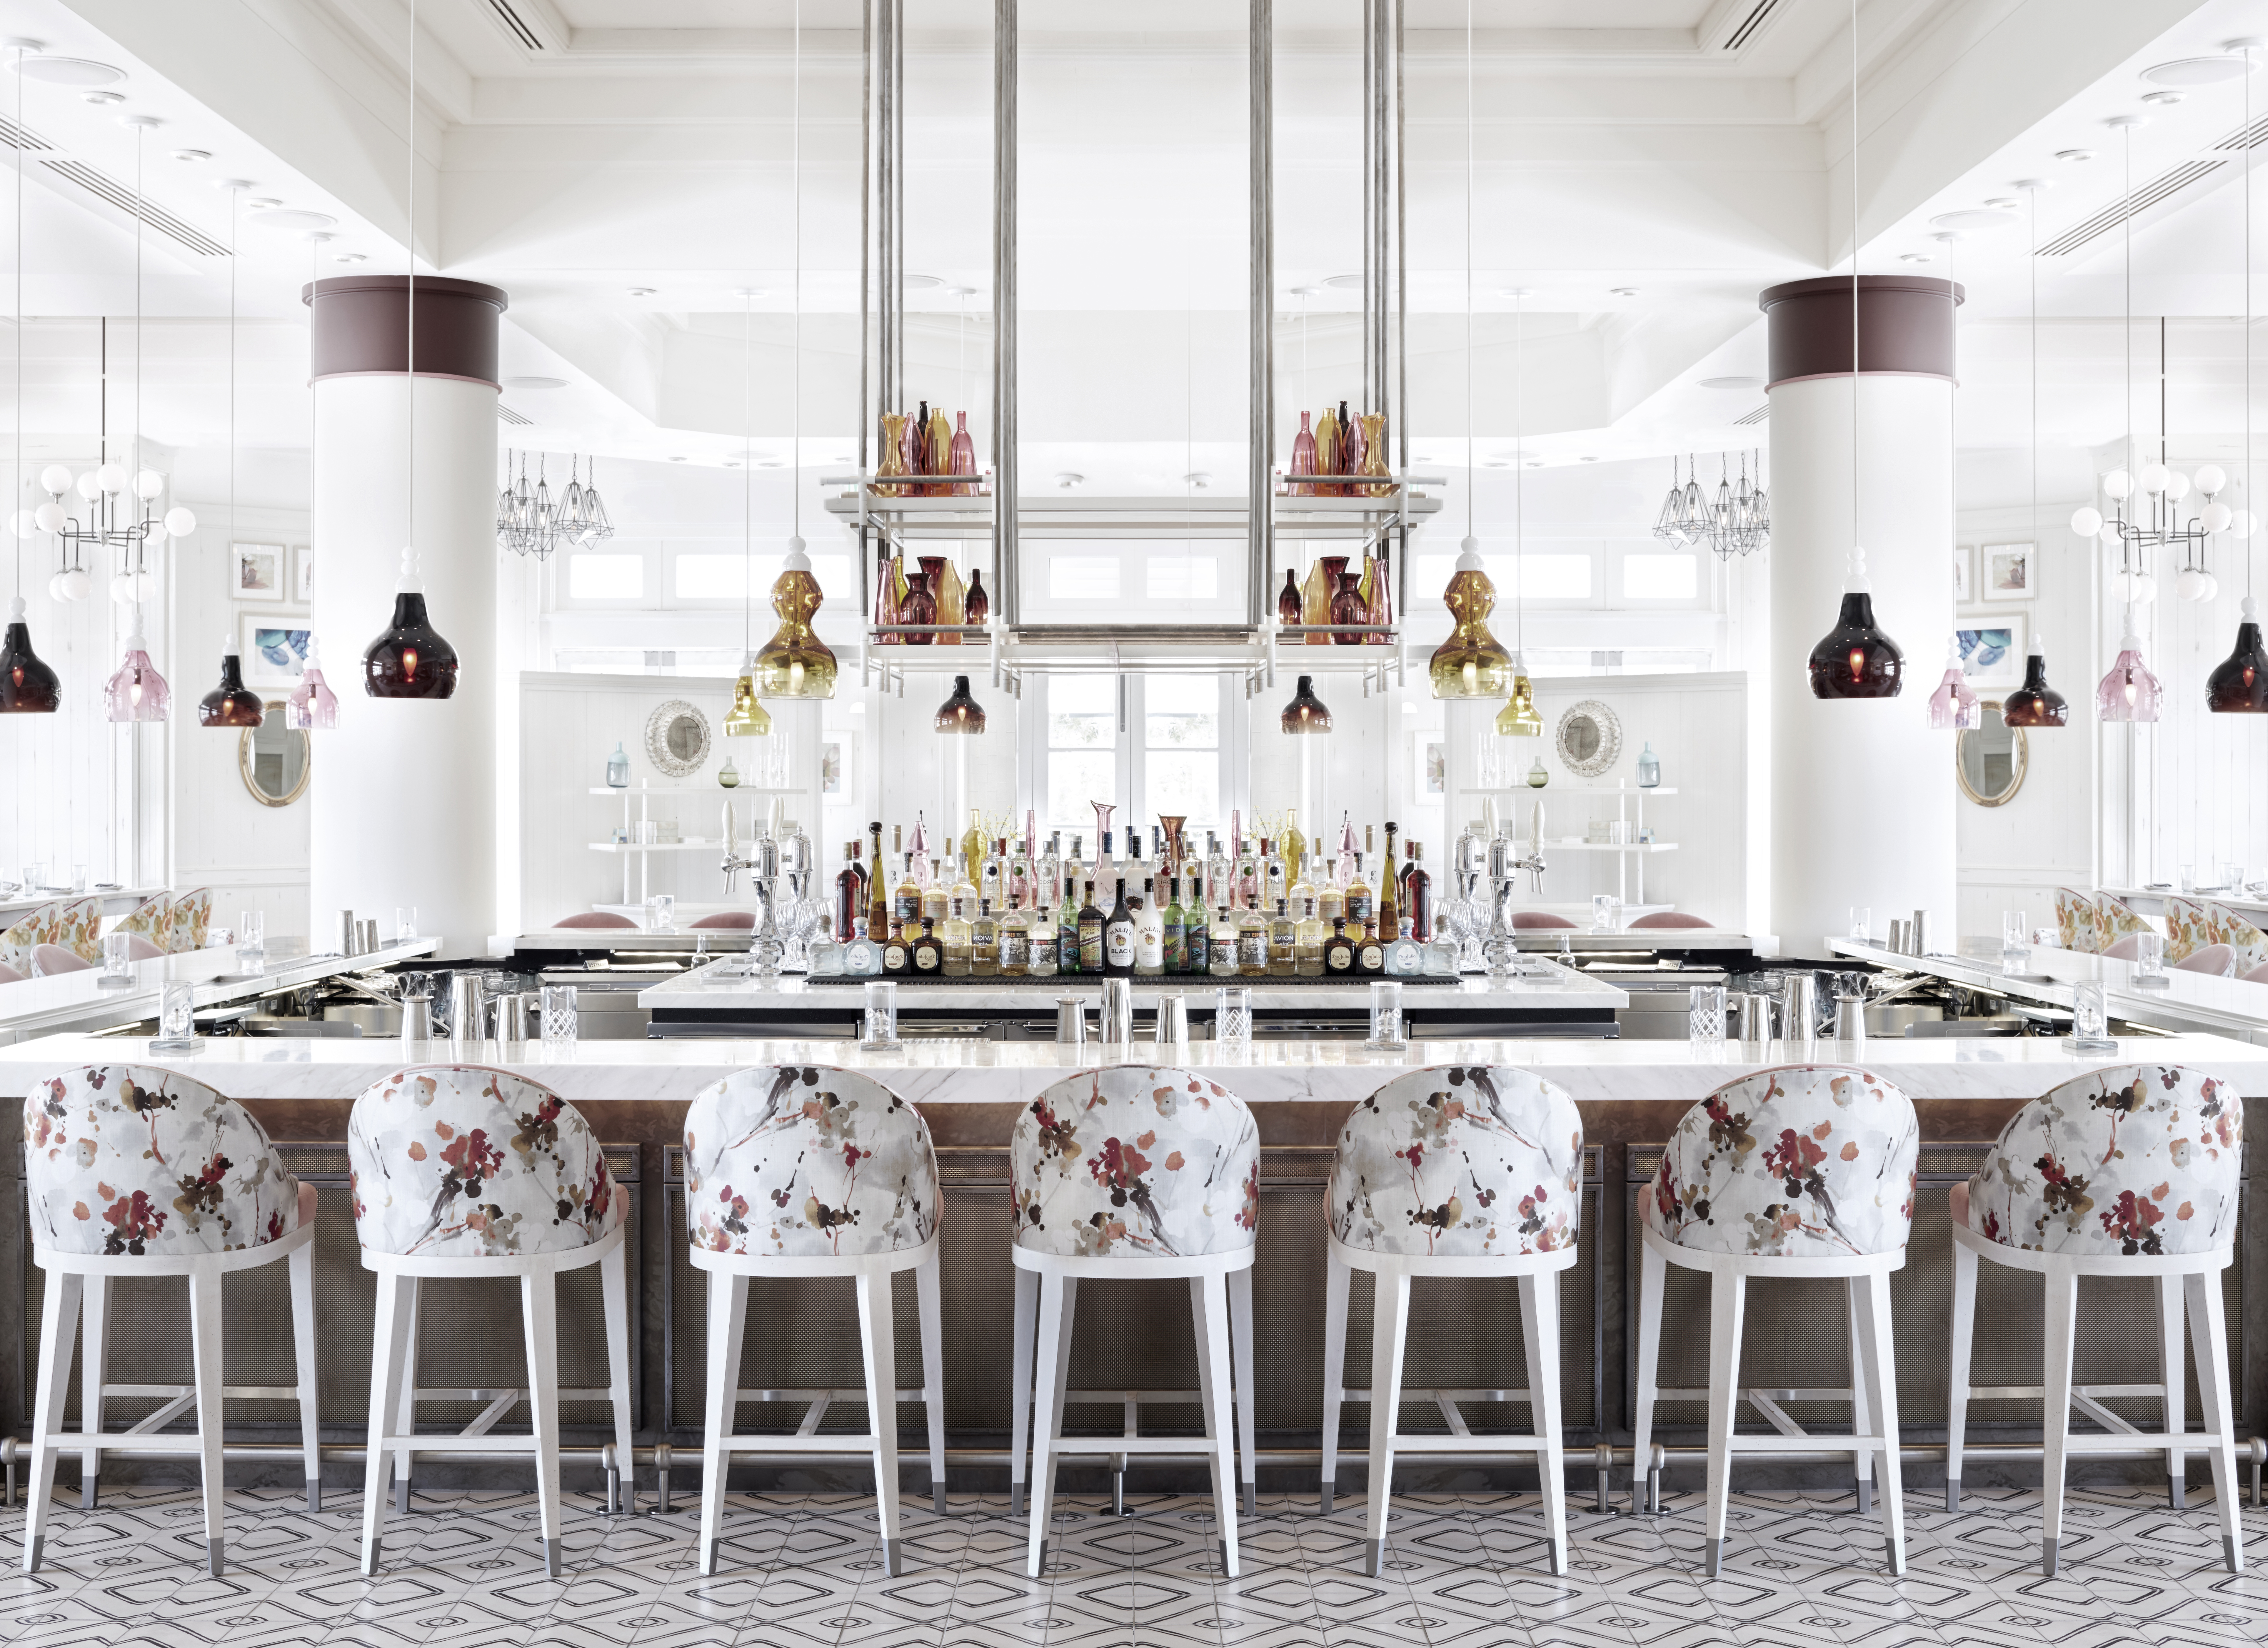 Bottiglia Cucina Enoteca, Green Valley Ranch, Las Vegas, Studio Munge